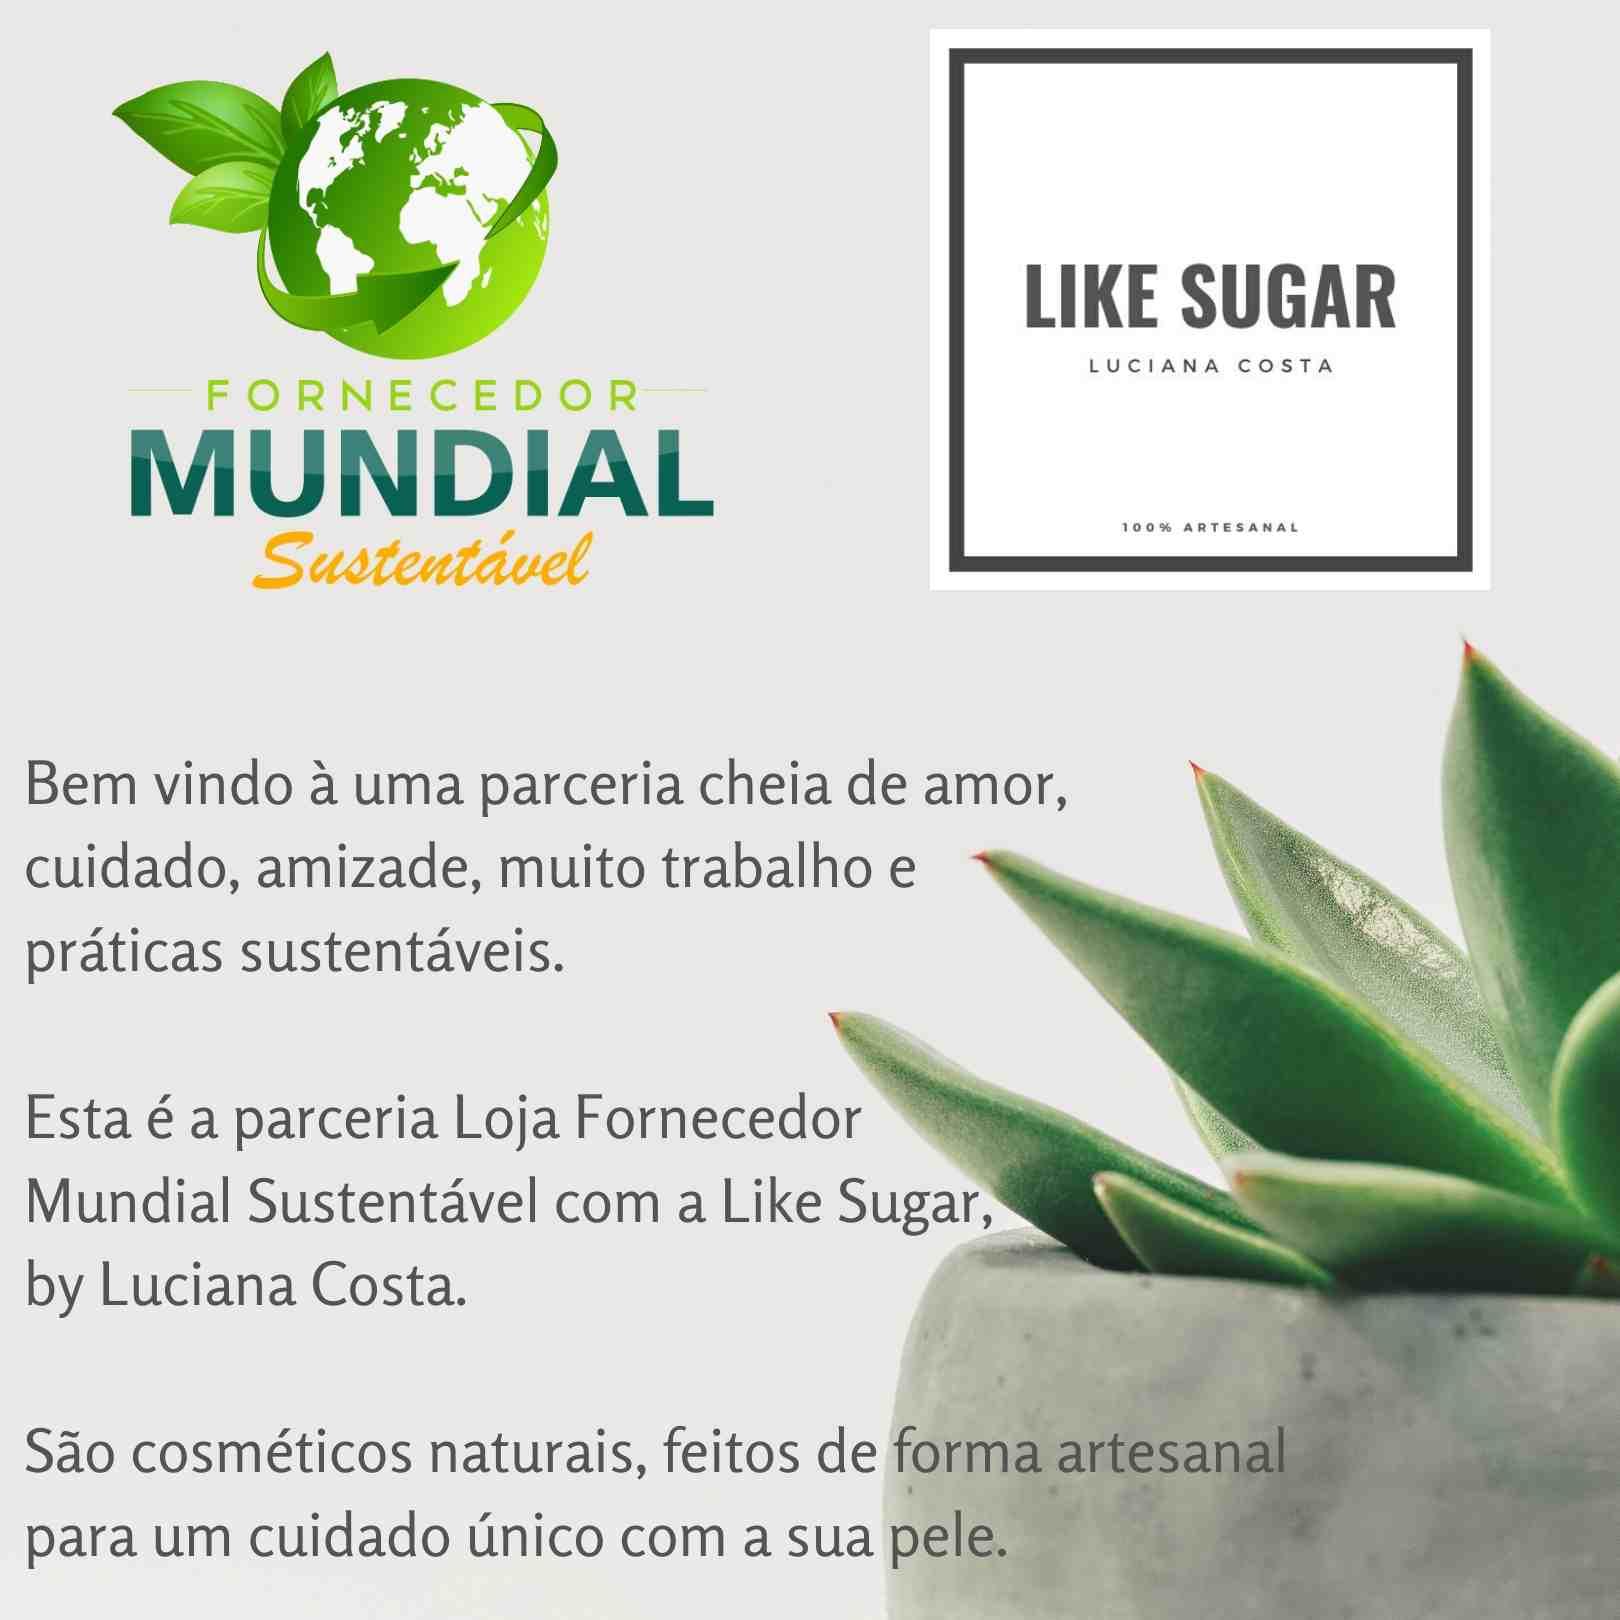 Manteiga Corporal Candy Cosmético Natural Artesanal Like Sugar